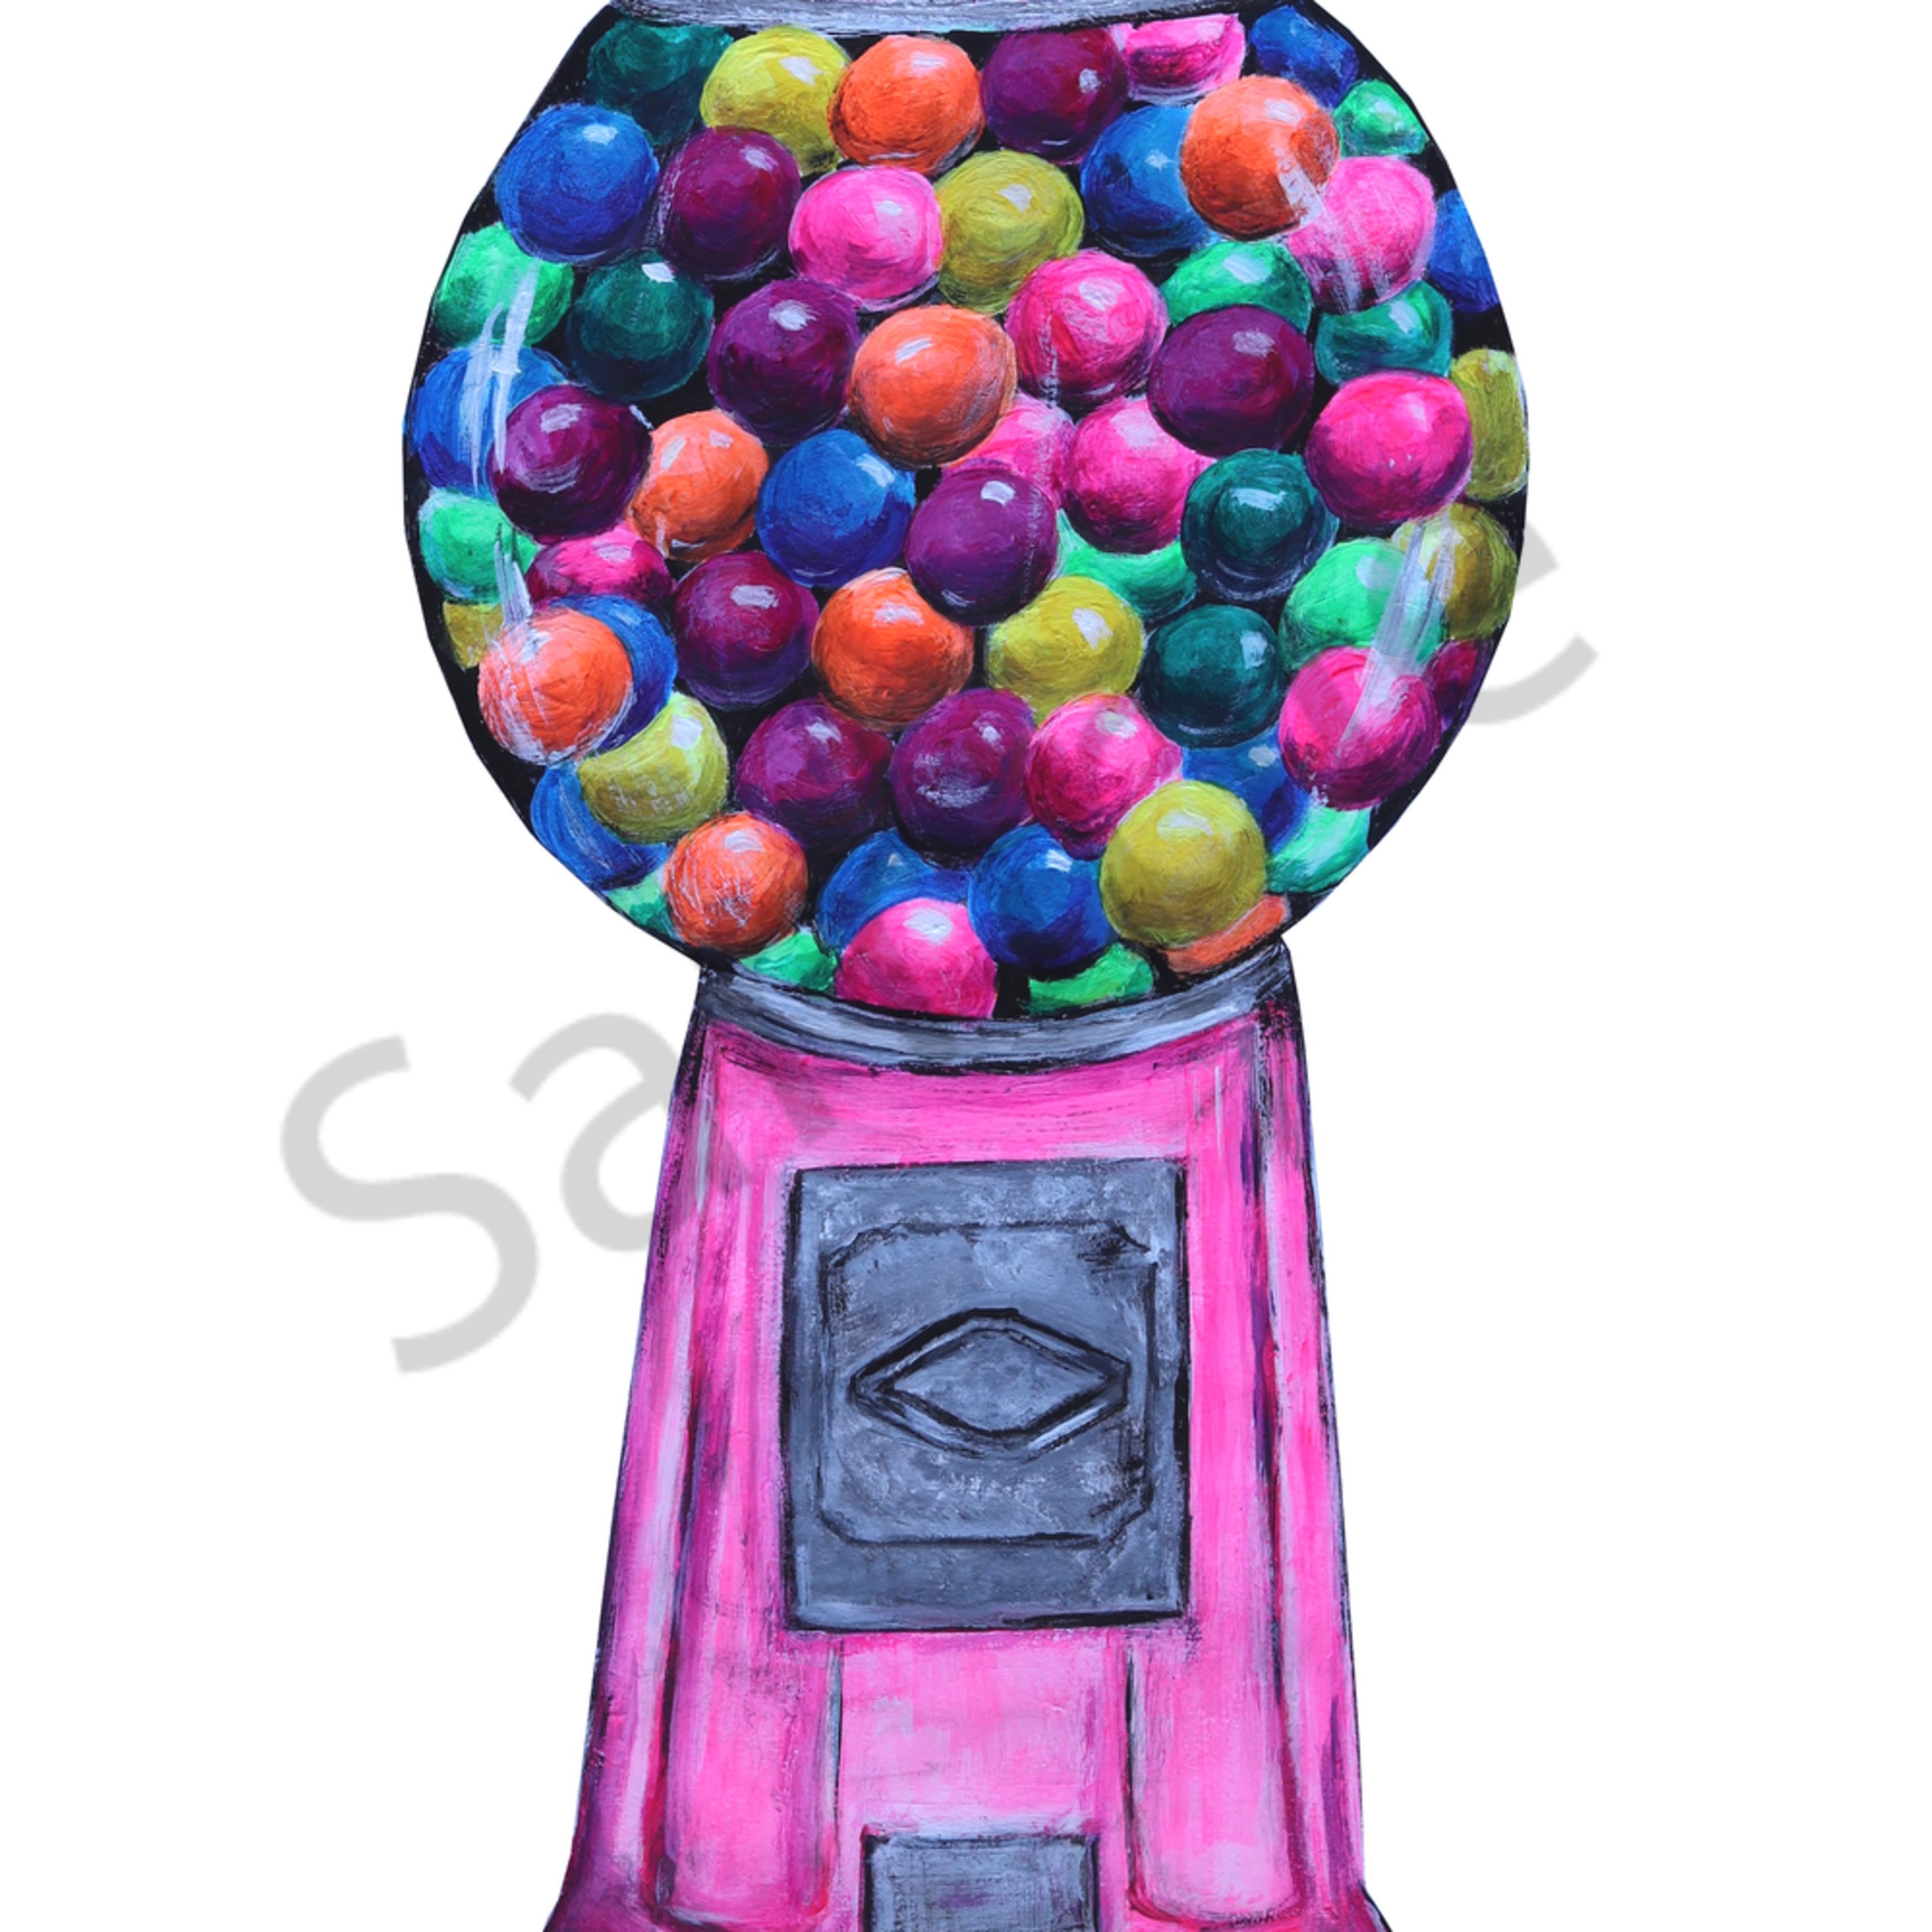 Bubble gum machine euqnzj